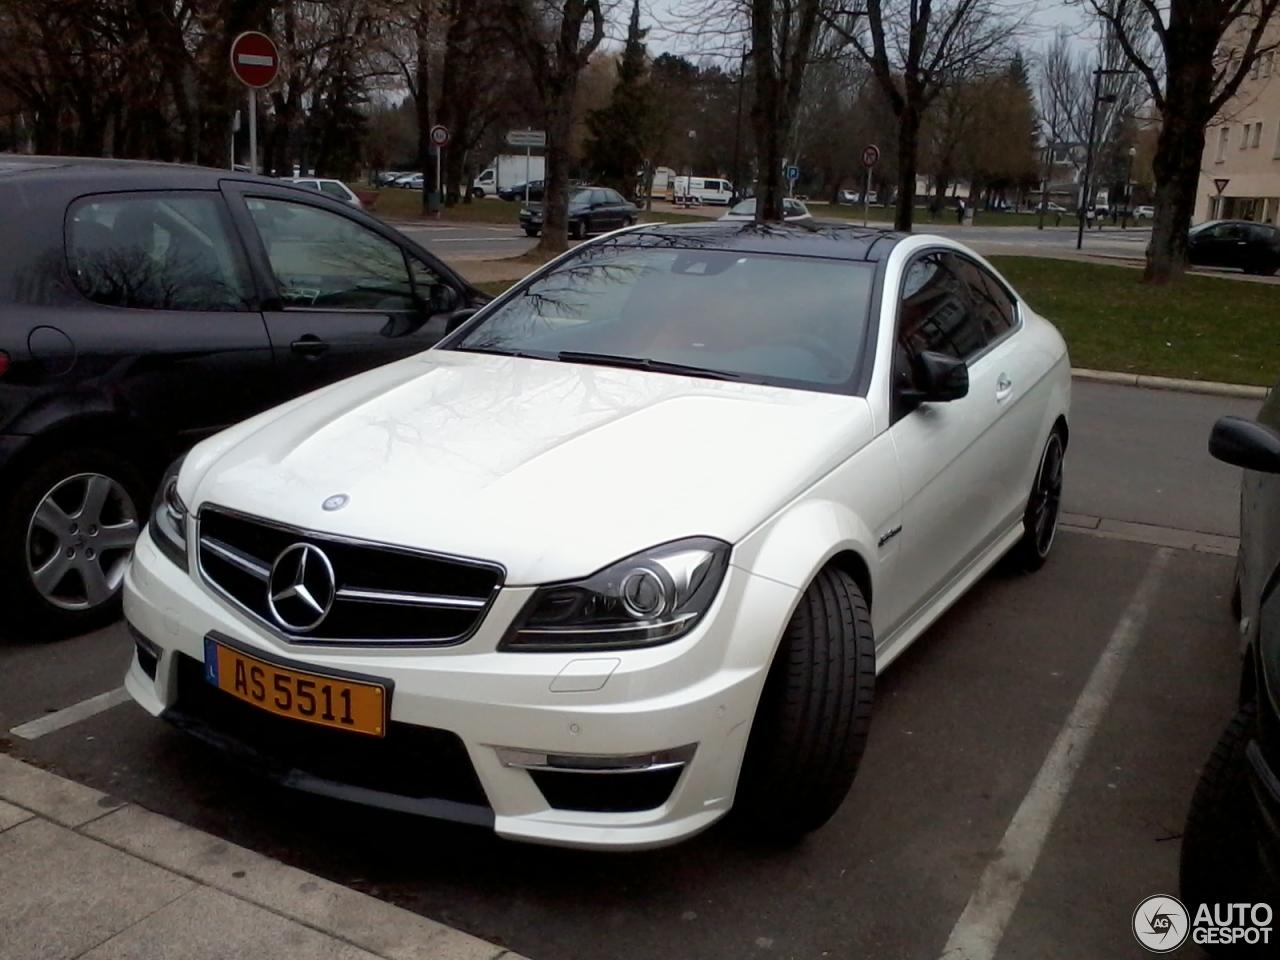 Mercedes benz c 63 amg coup 22 fvrier 2013 autogespot for Mercedes benz raleigh nc sale